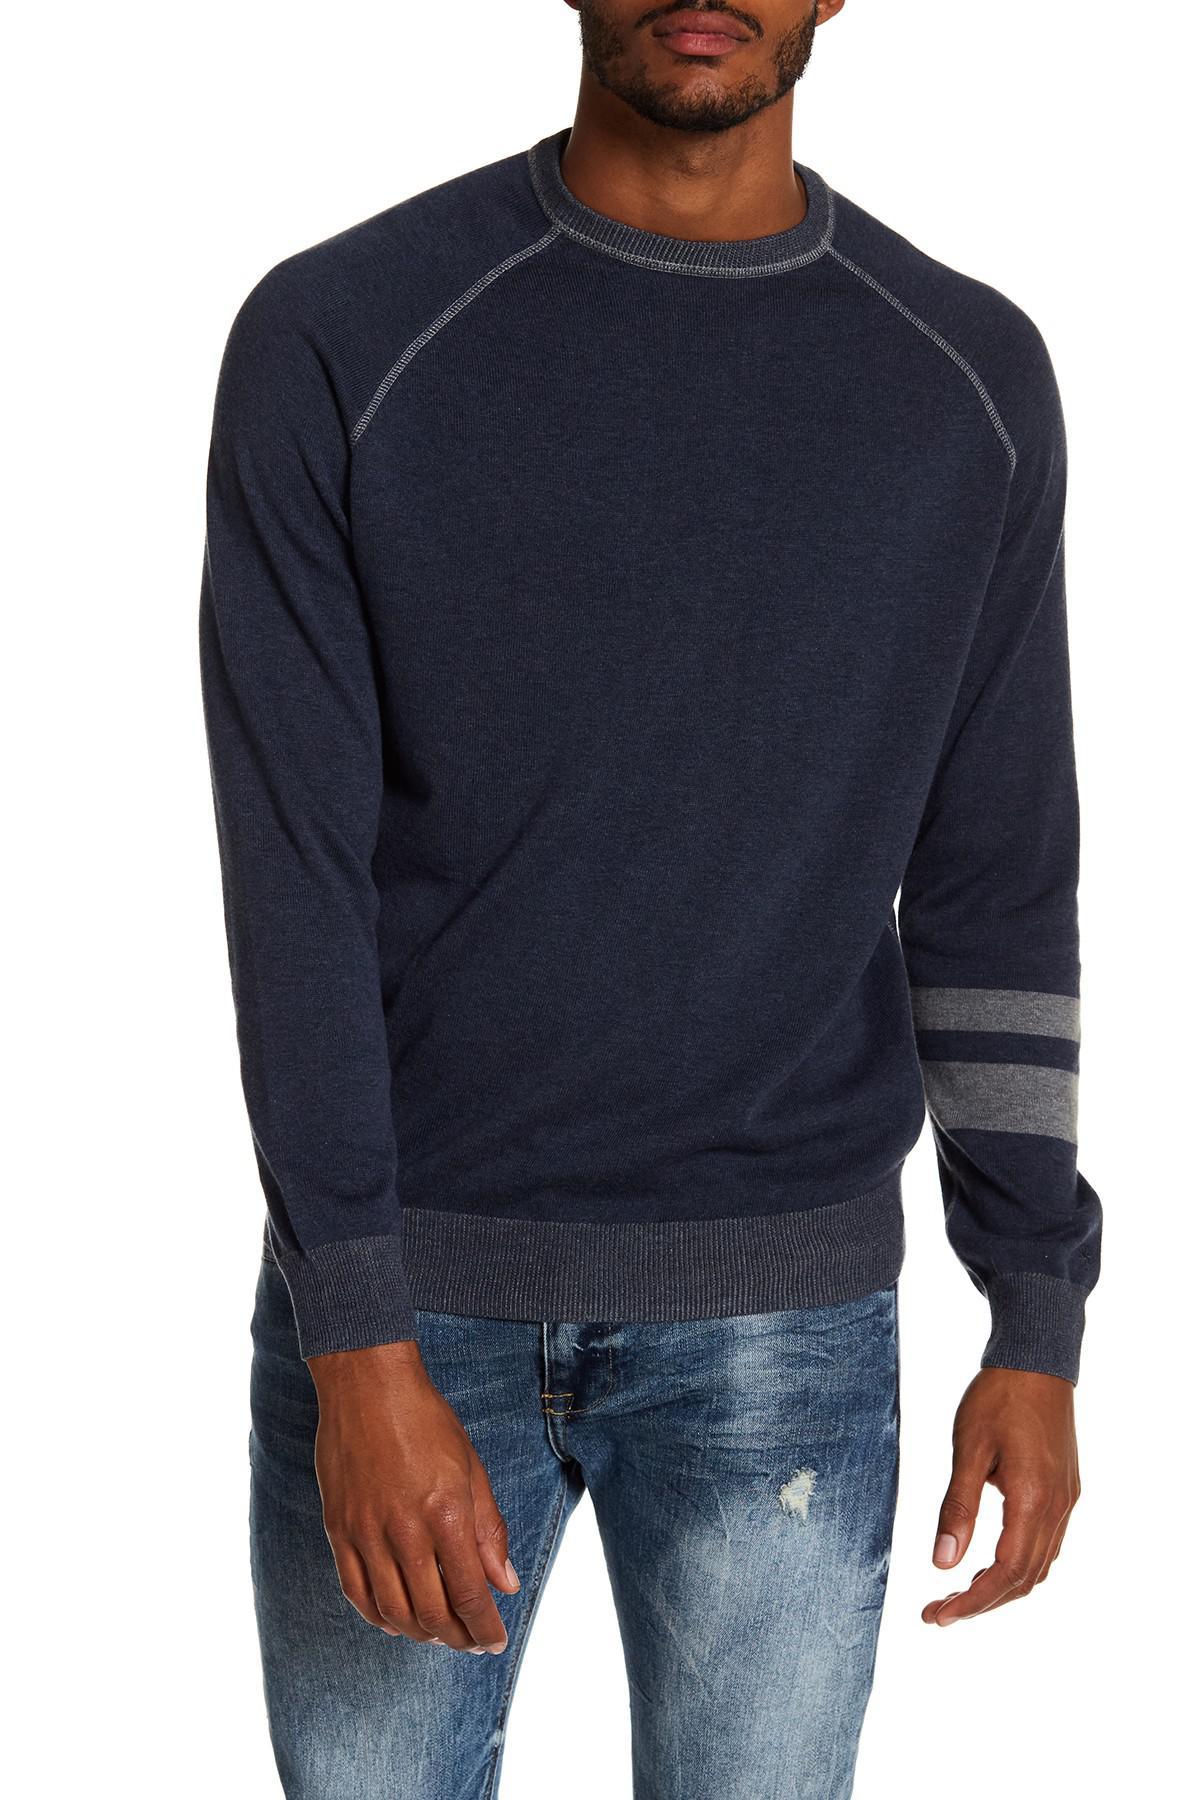 Agave Folsom Raglan Crew Neck Sweater in Blue for Men